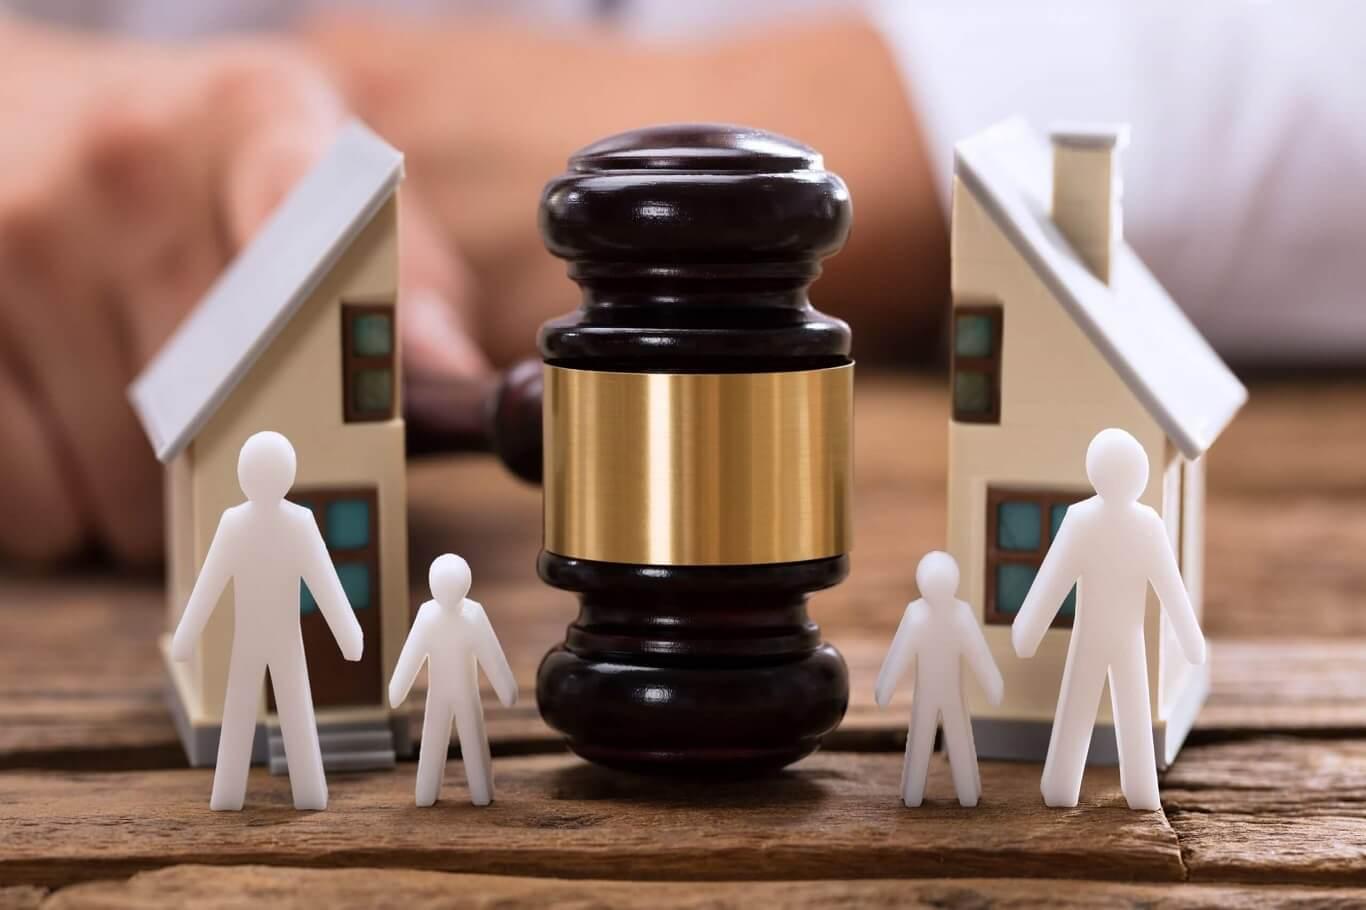 tips for testifying infamilycourt